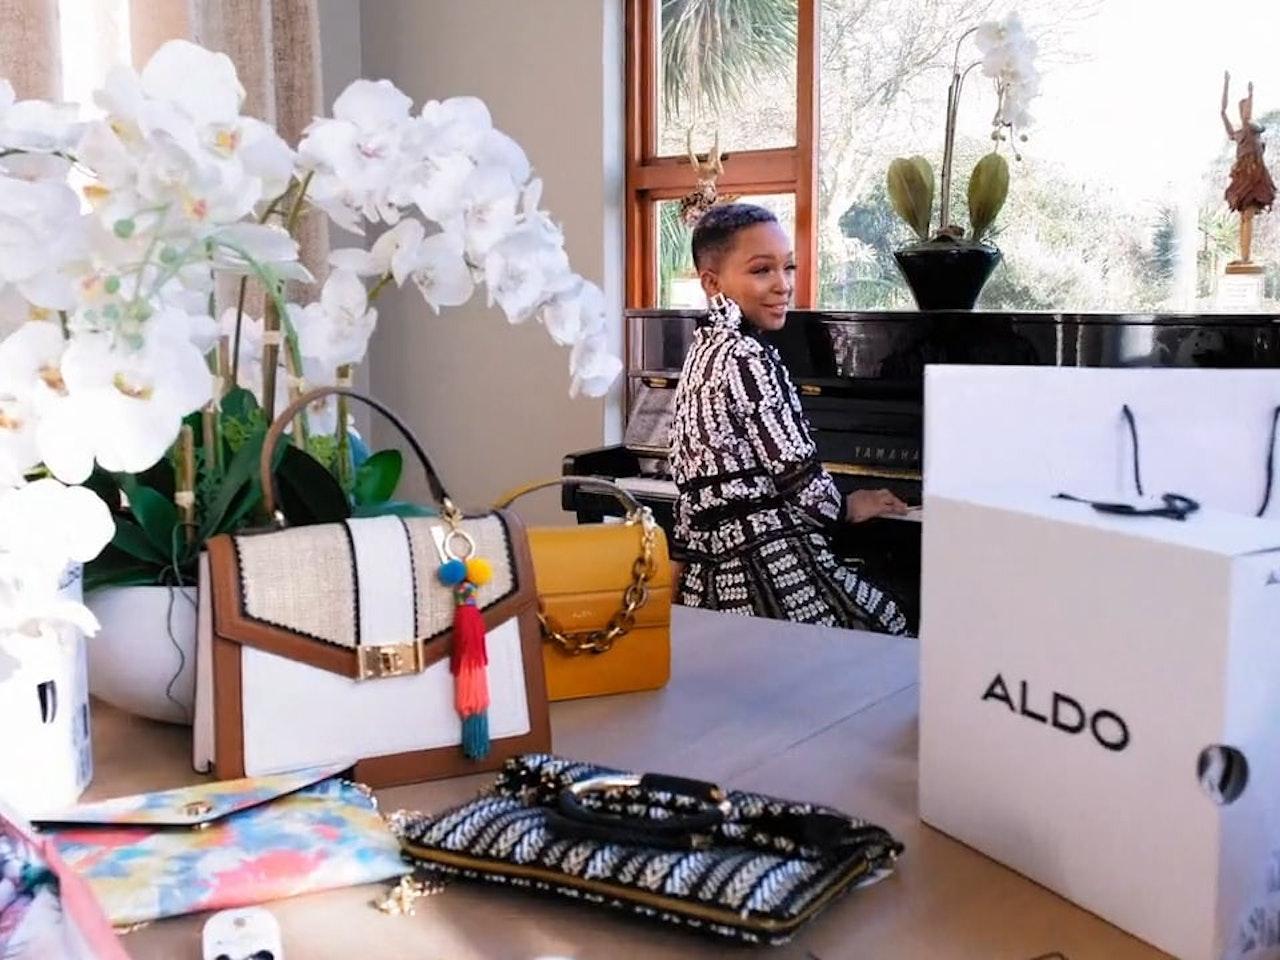 ALDO Shoes - Power Women